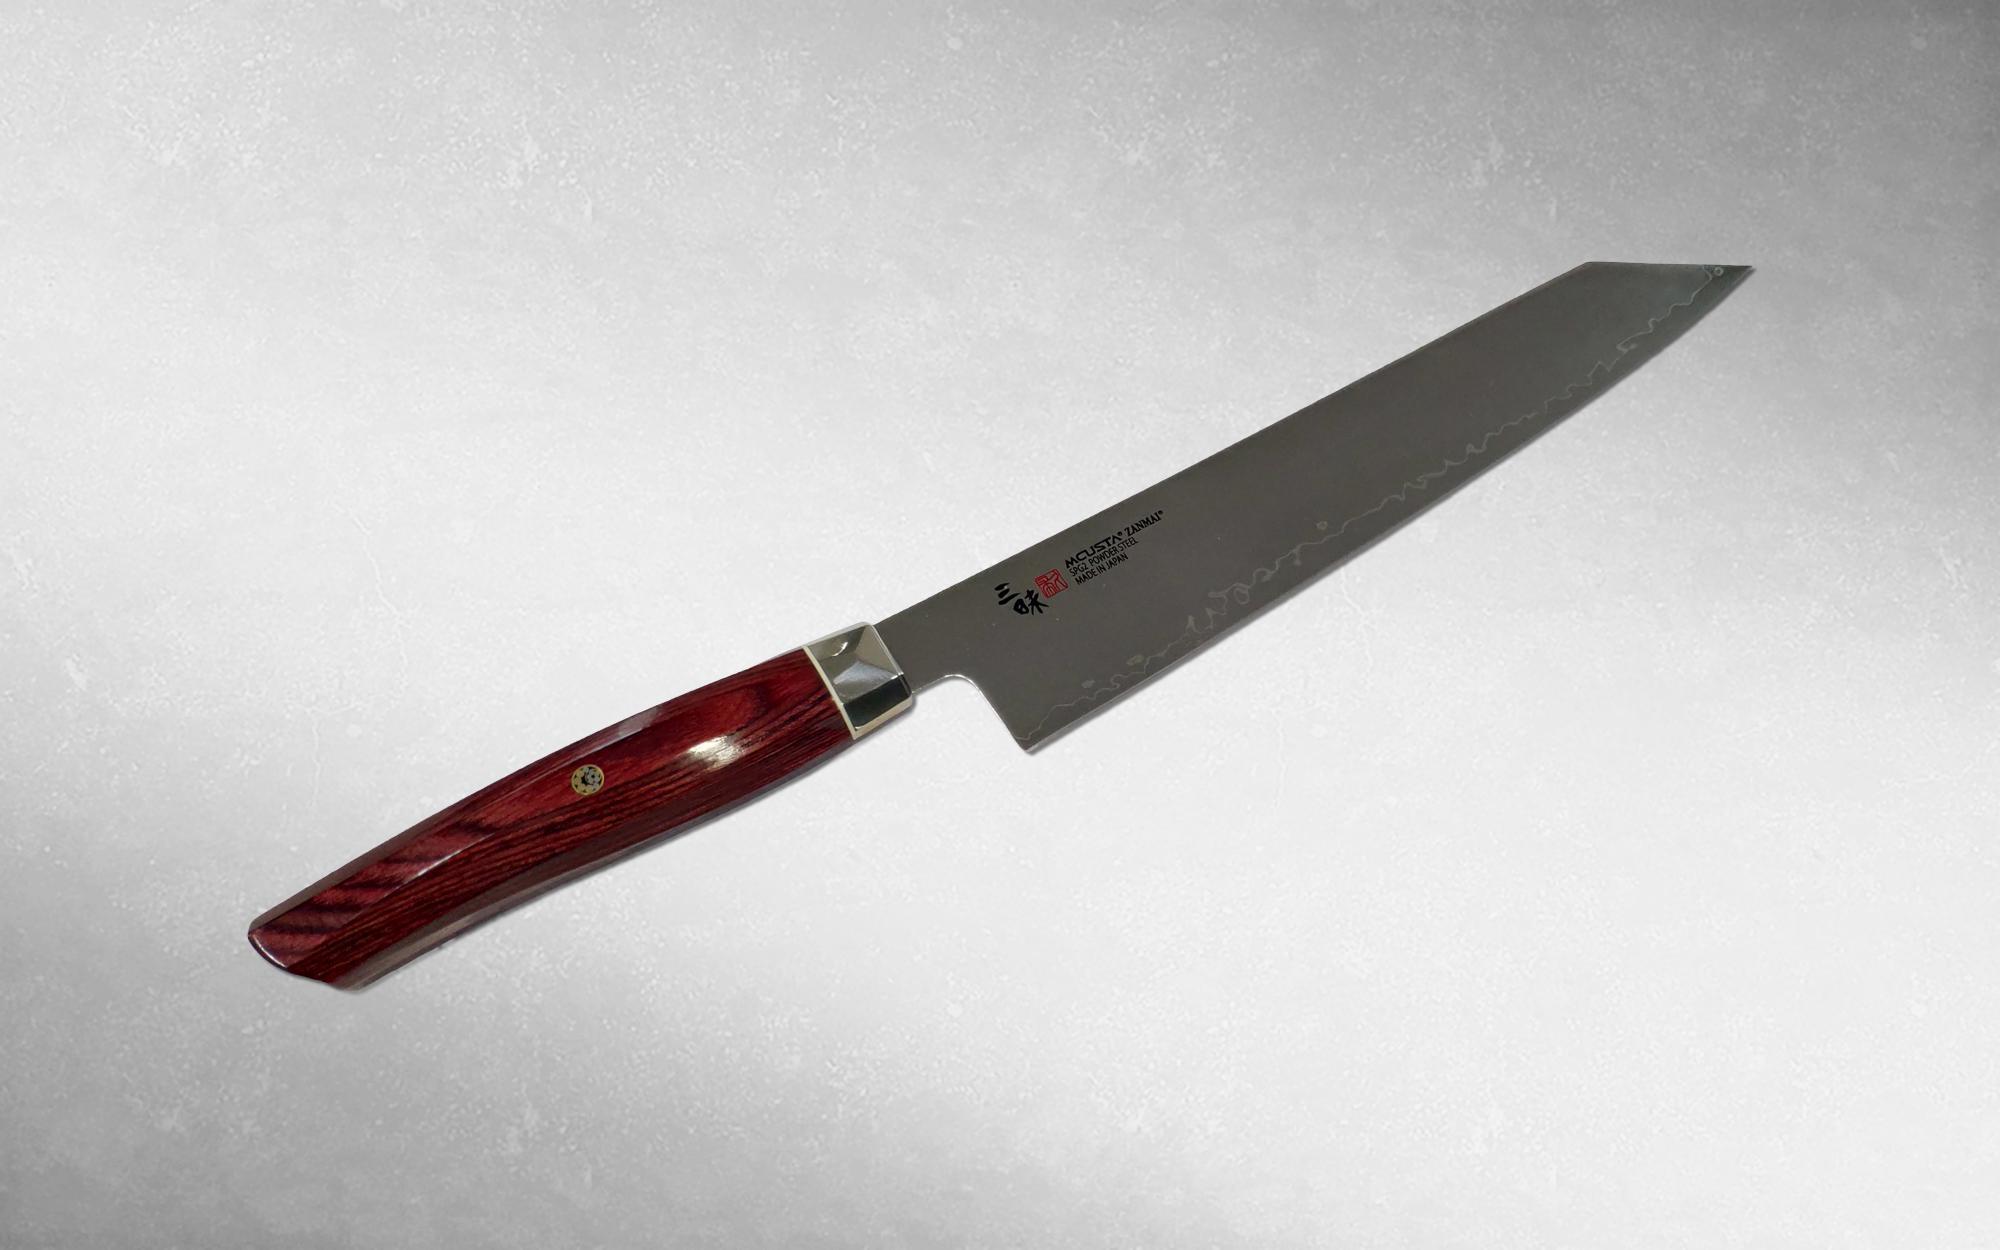 Нож кухонный Шеф Kiritsuke Mcusta Zanmai Revolution 230 мм, Takamura, ZPR-1206G, сталь SPG2, стабилизированная древисина, коричневый